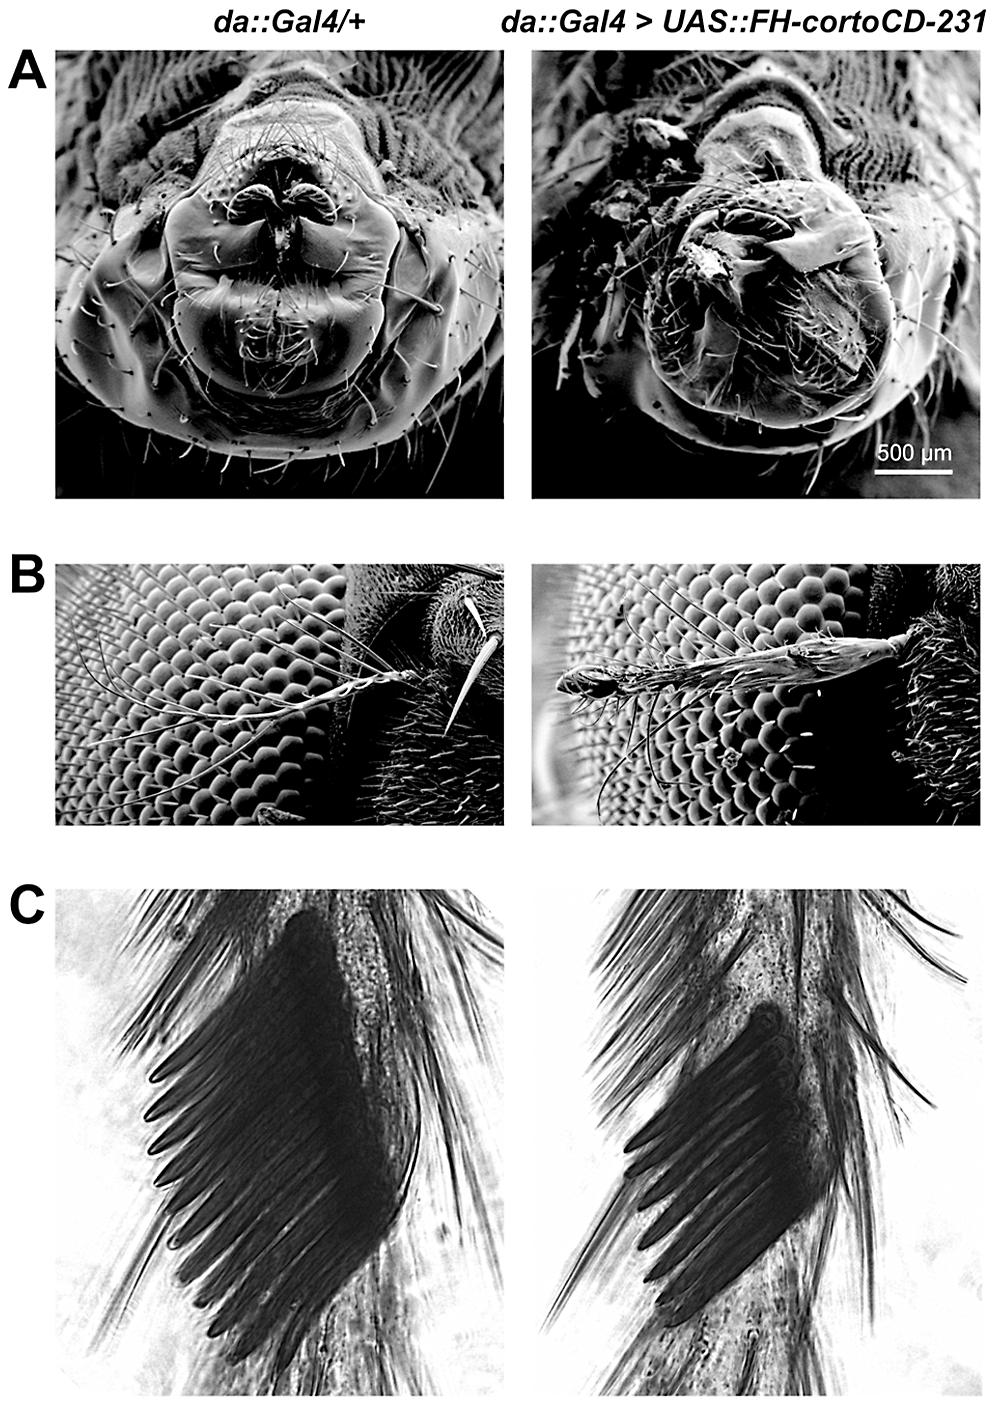 Phenotype of transgenic flies over-expressing <i>cortoCD</i>.